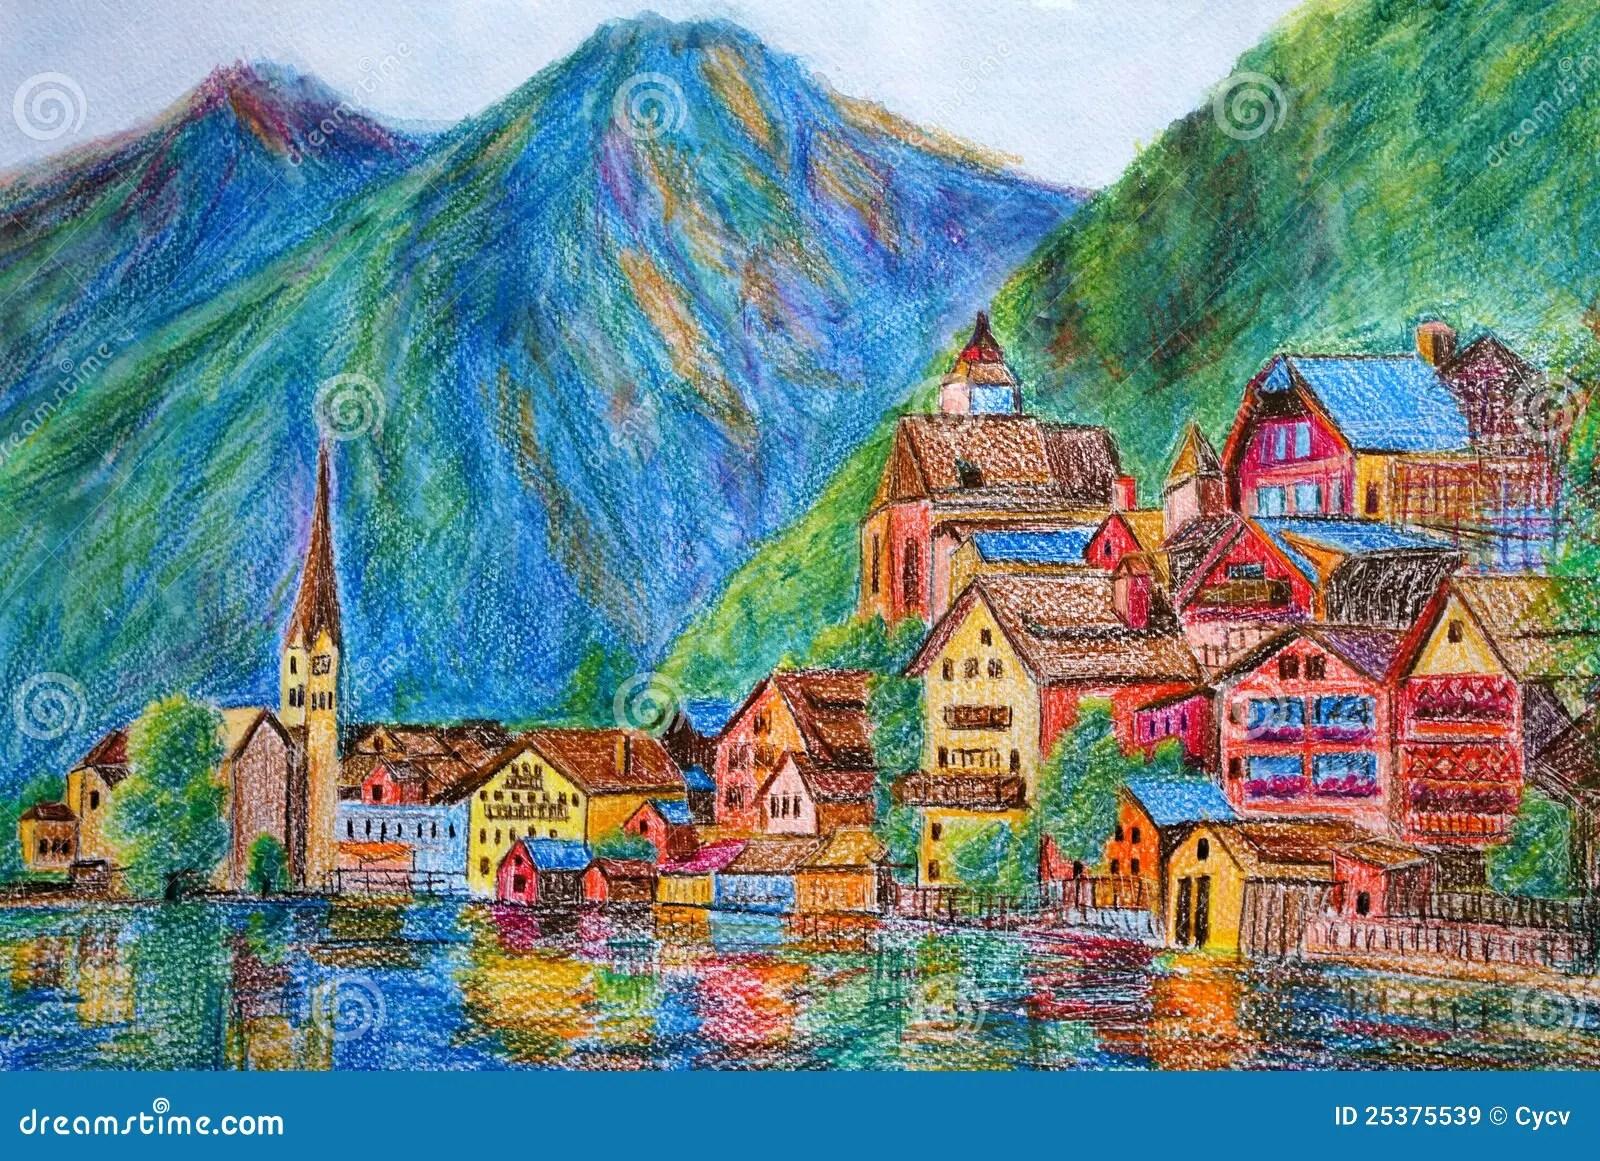 Fall Church Pictures Free Wallpaper Pastel Painting Austria Hallstatt Royalty Free Stock